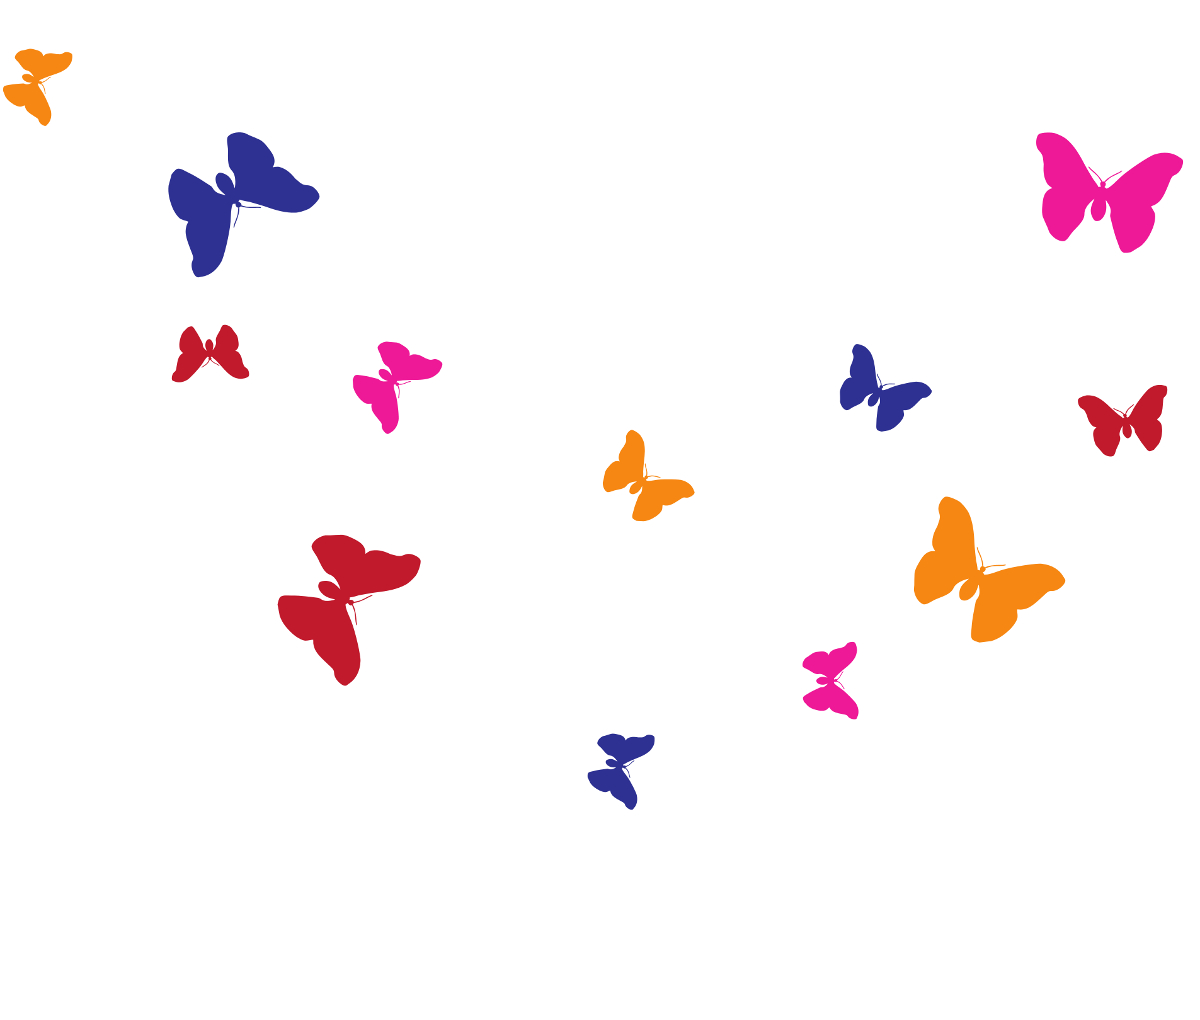 Schmetterlinge bunt Wandtattoos